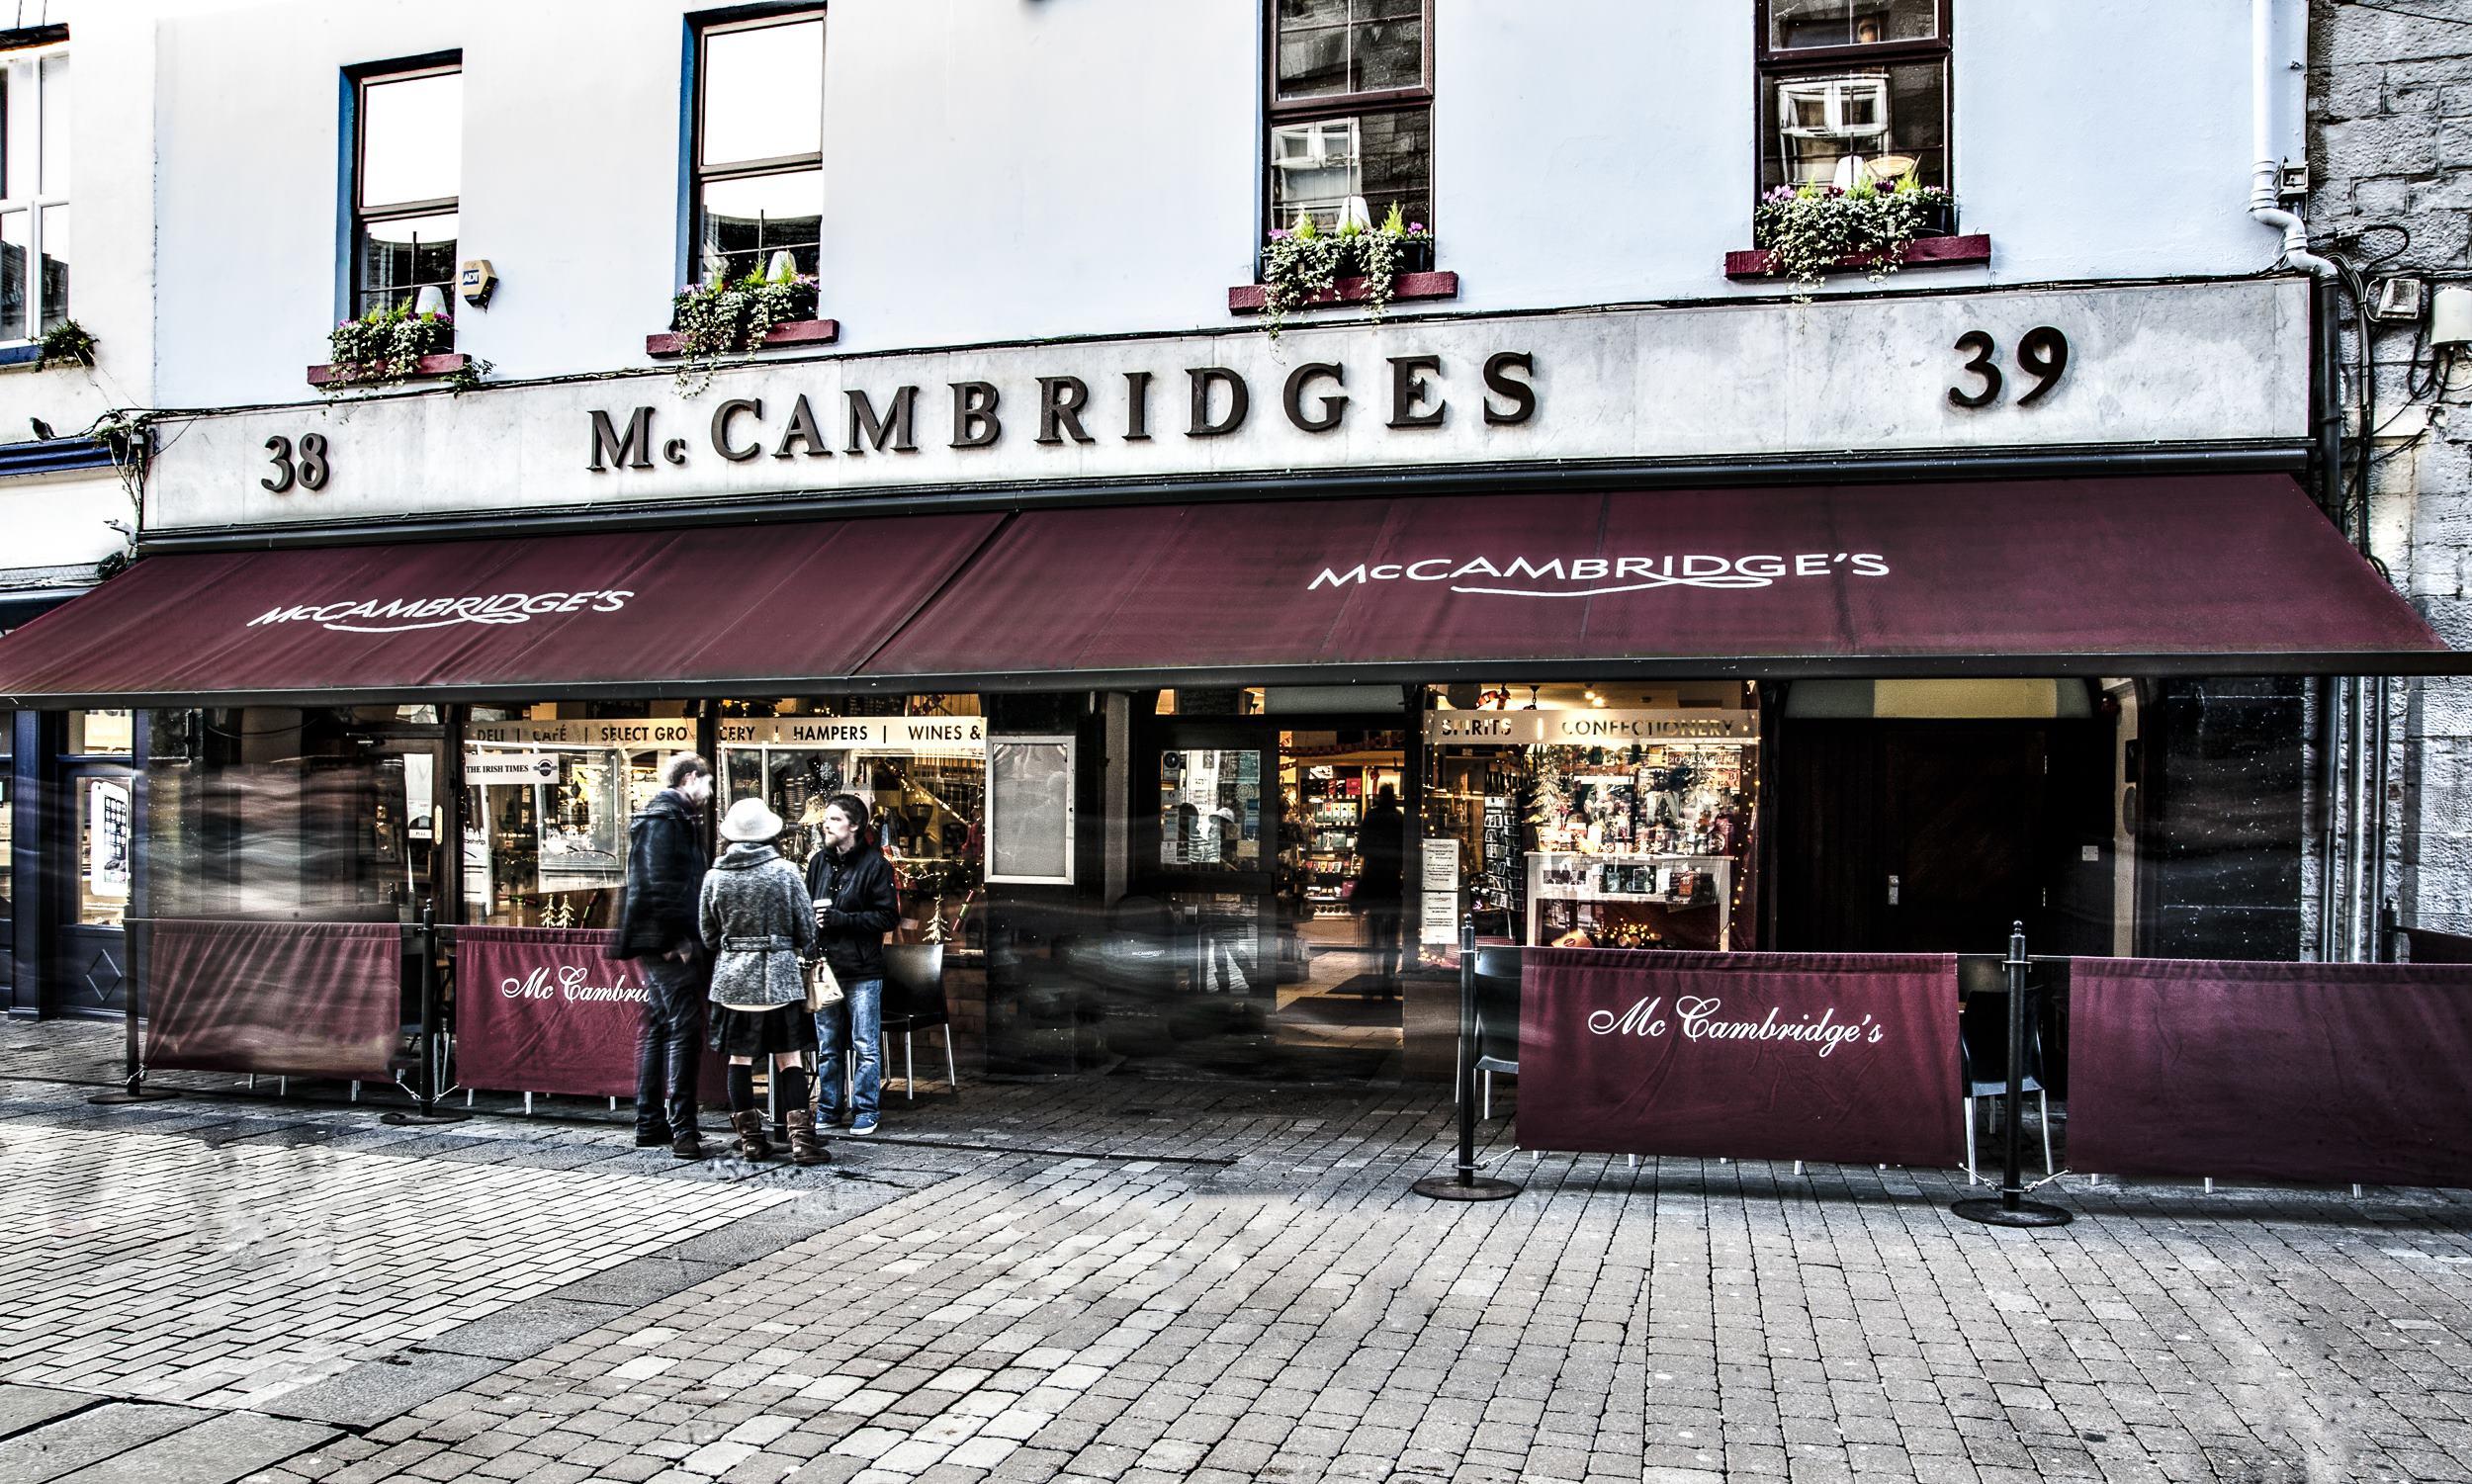 McCambridge's of Galway photo.jpg